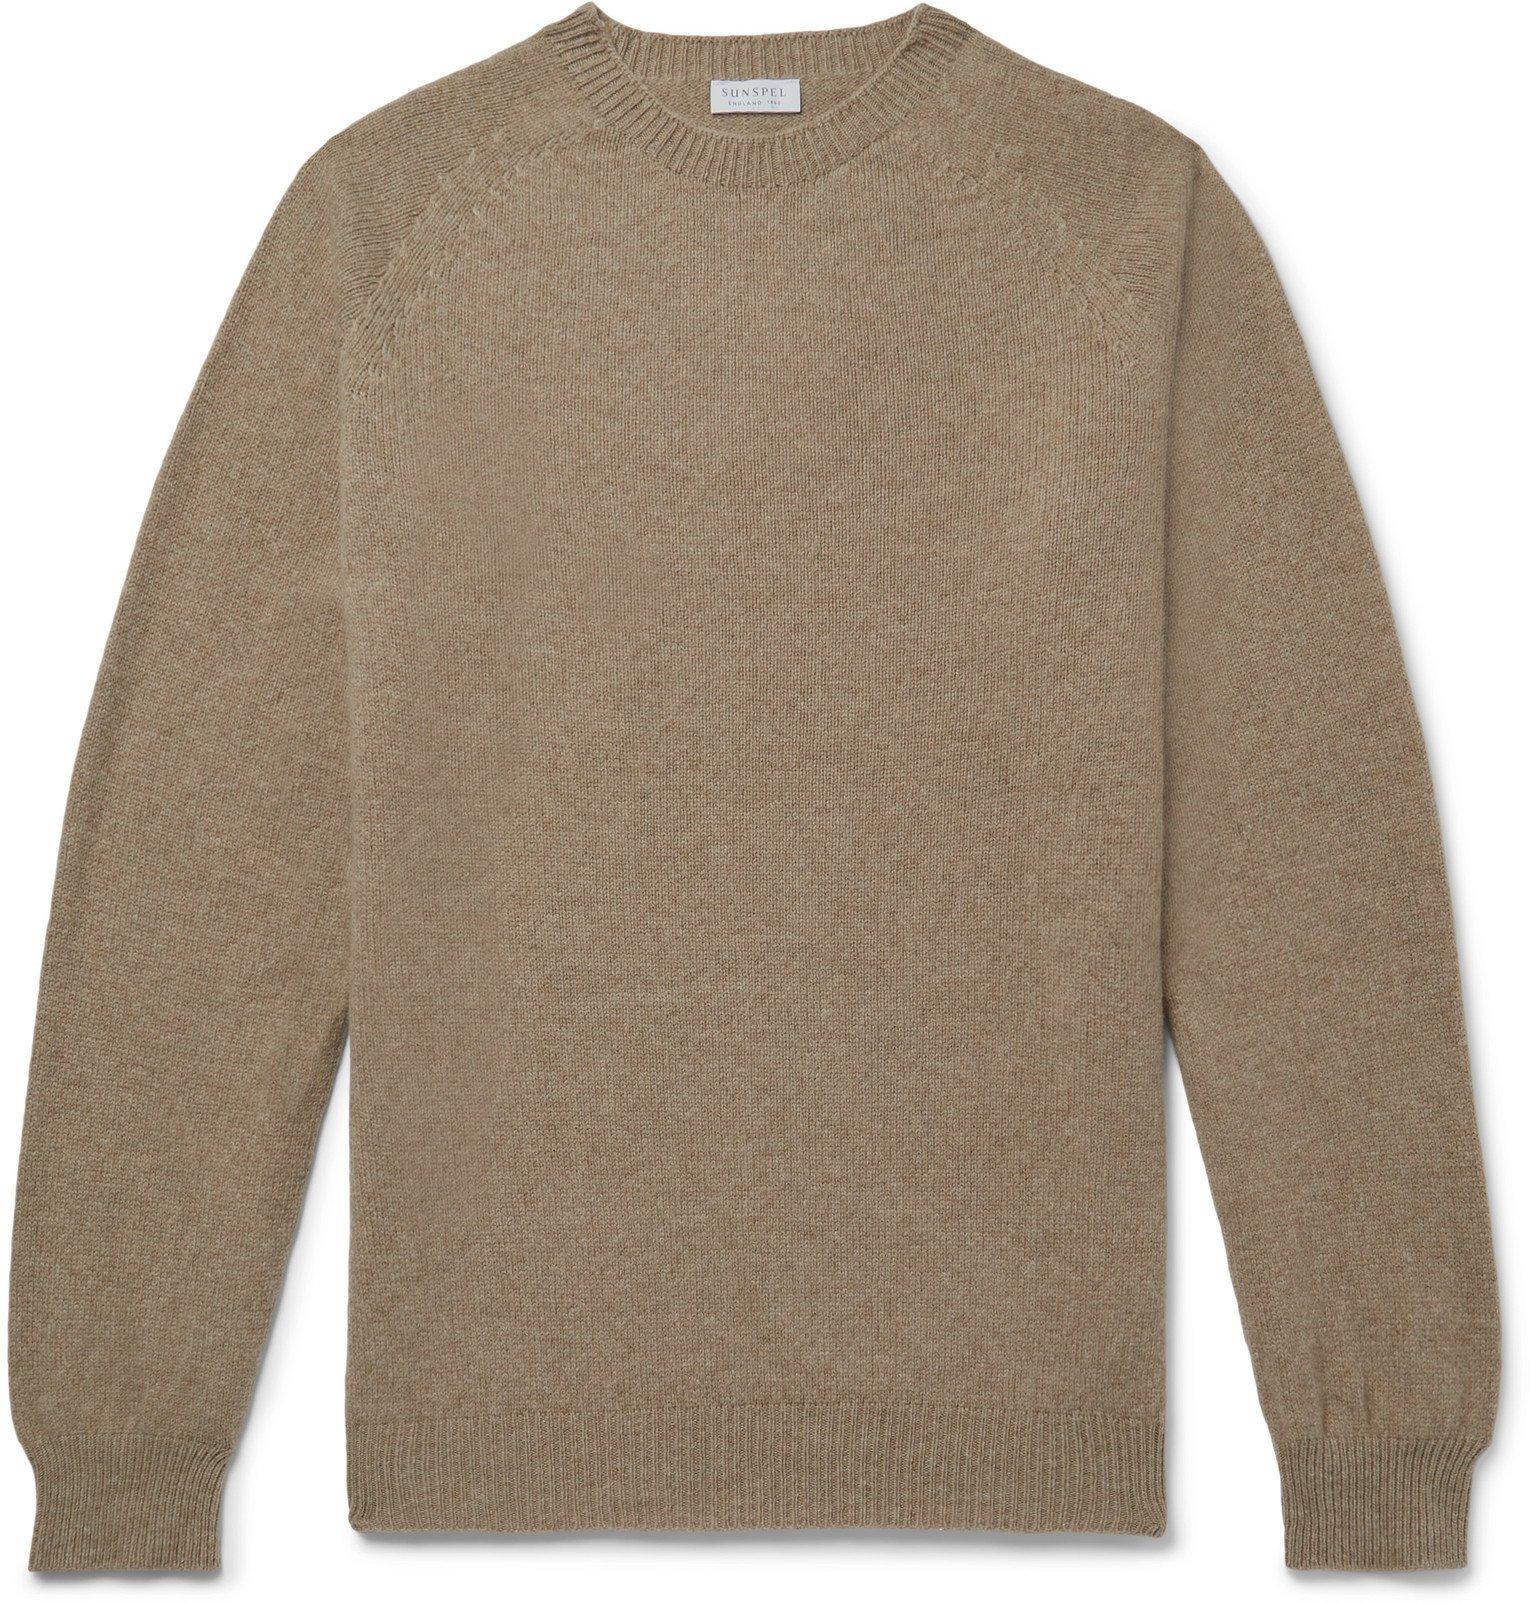 Sunspel - Slim-Fit Wool Sweater - Brown